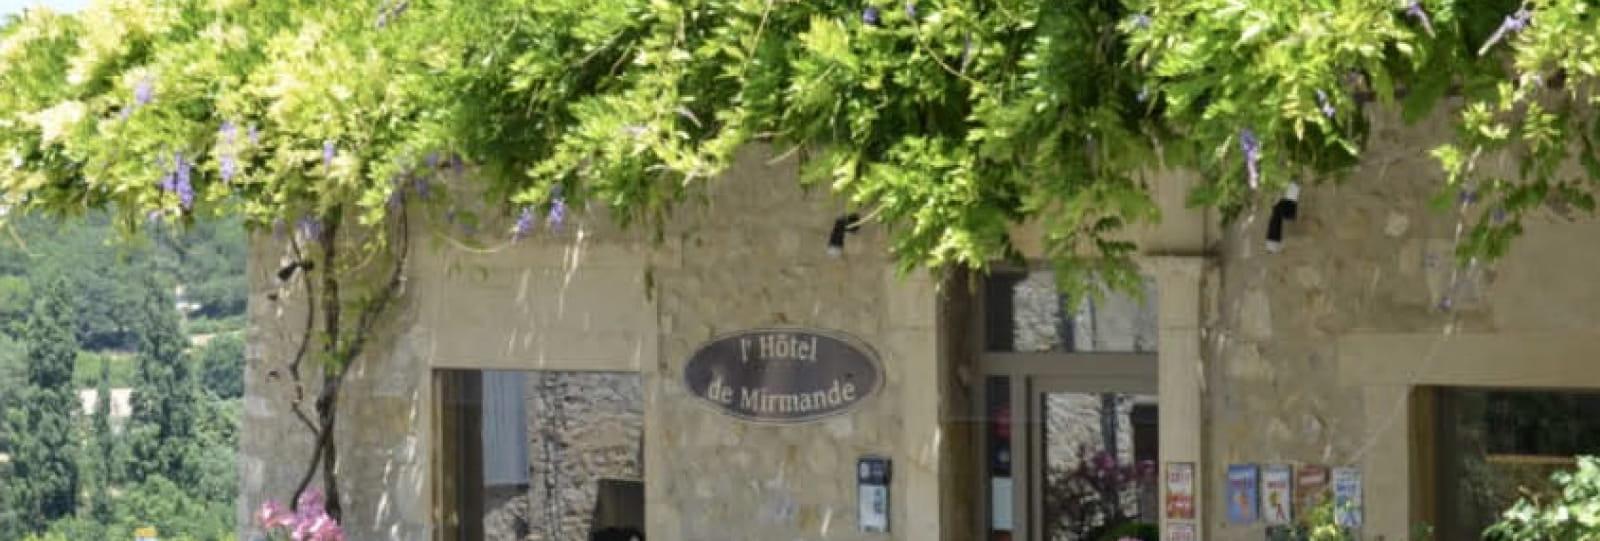 Hôtel de Mirmande